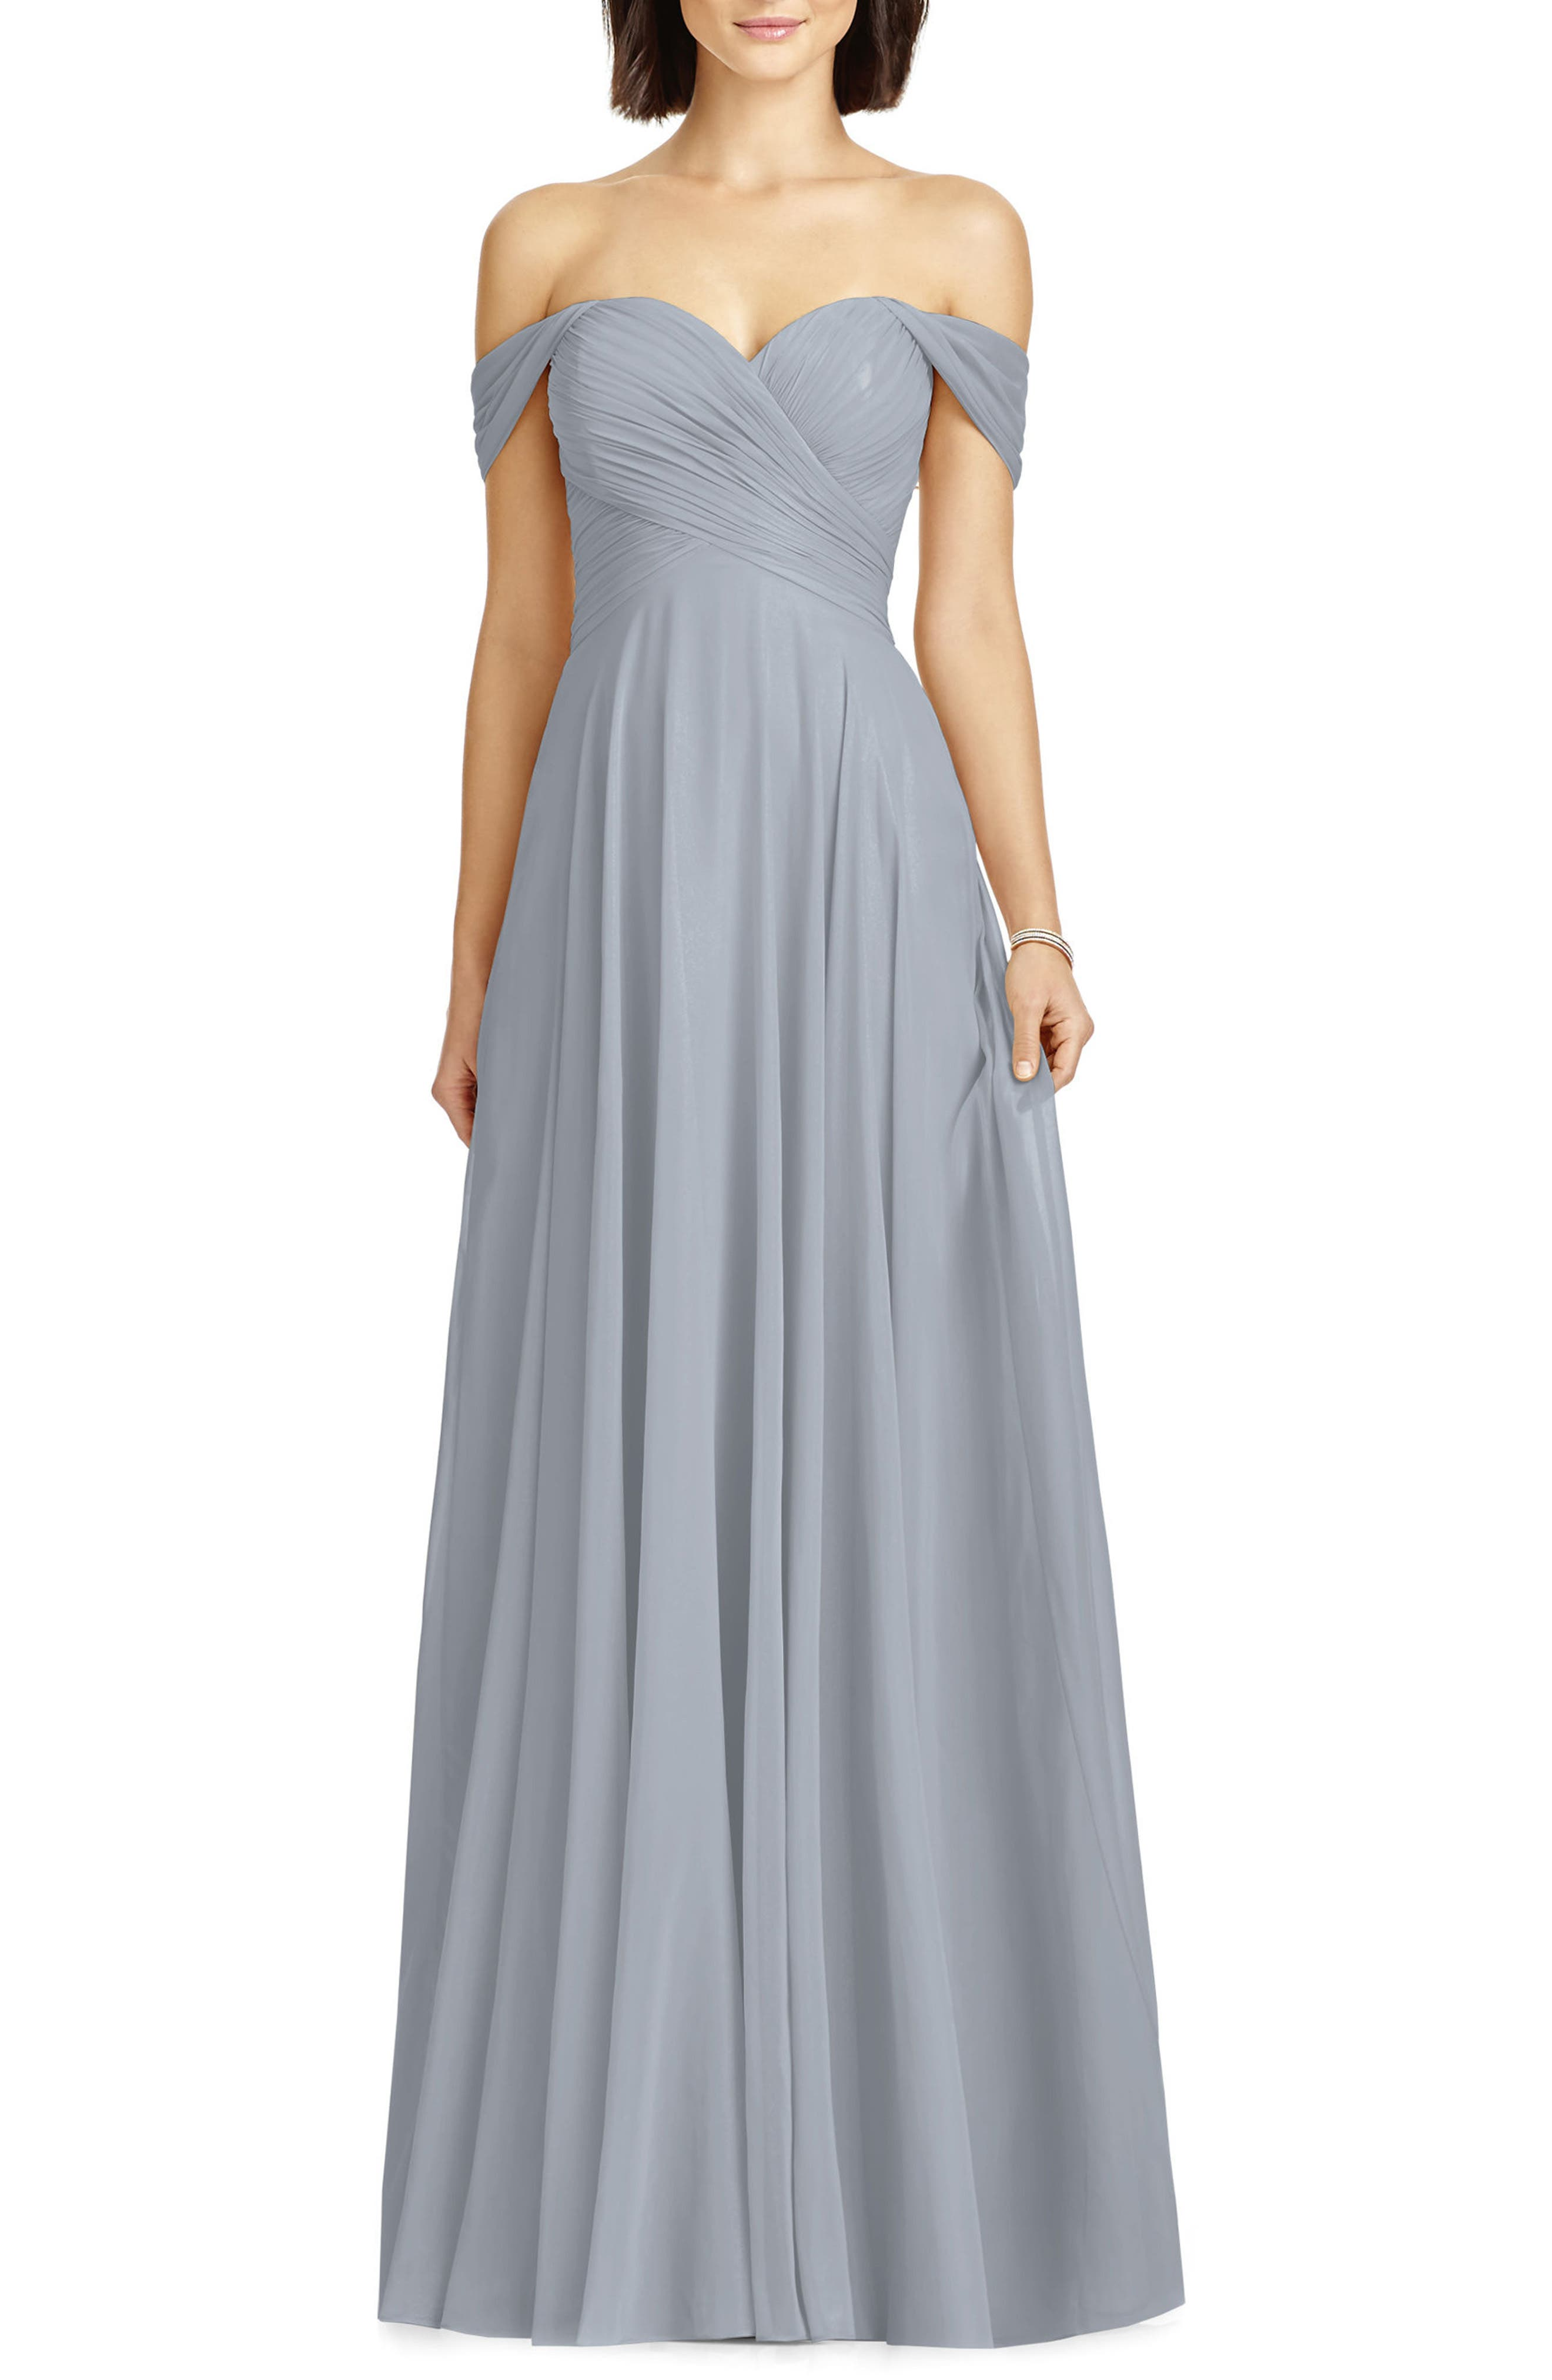 Off-The-Shoulder Chiffon Dress